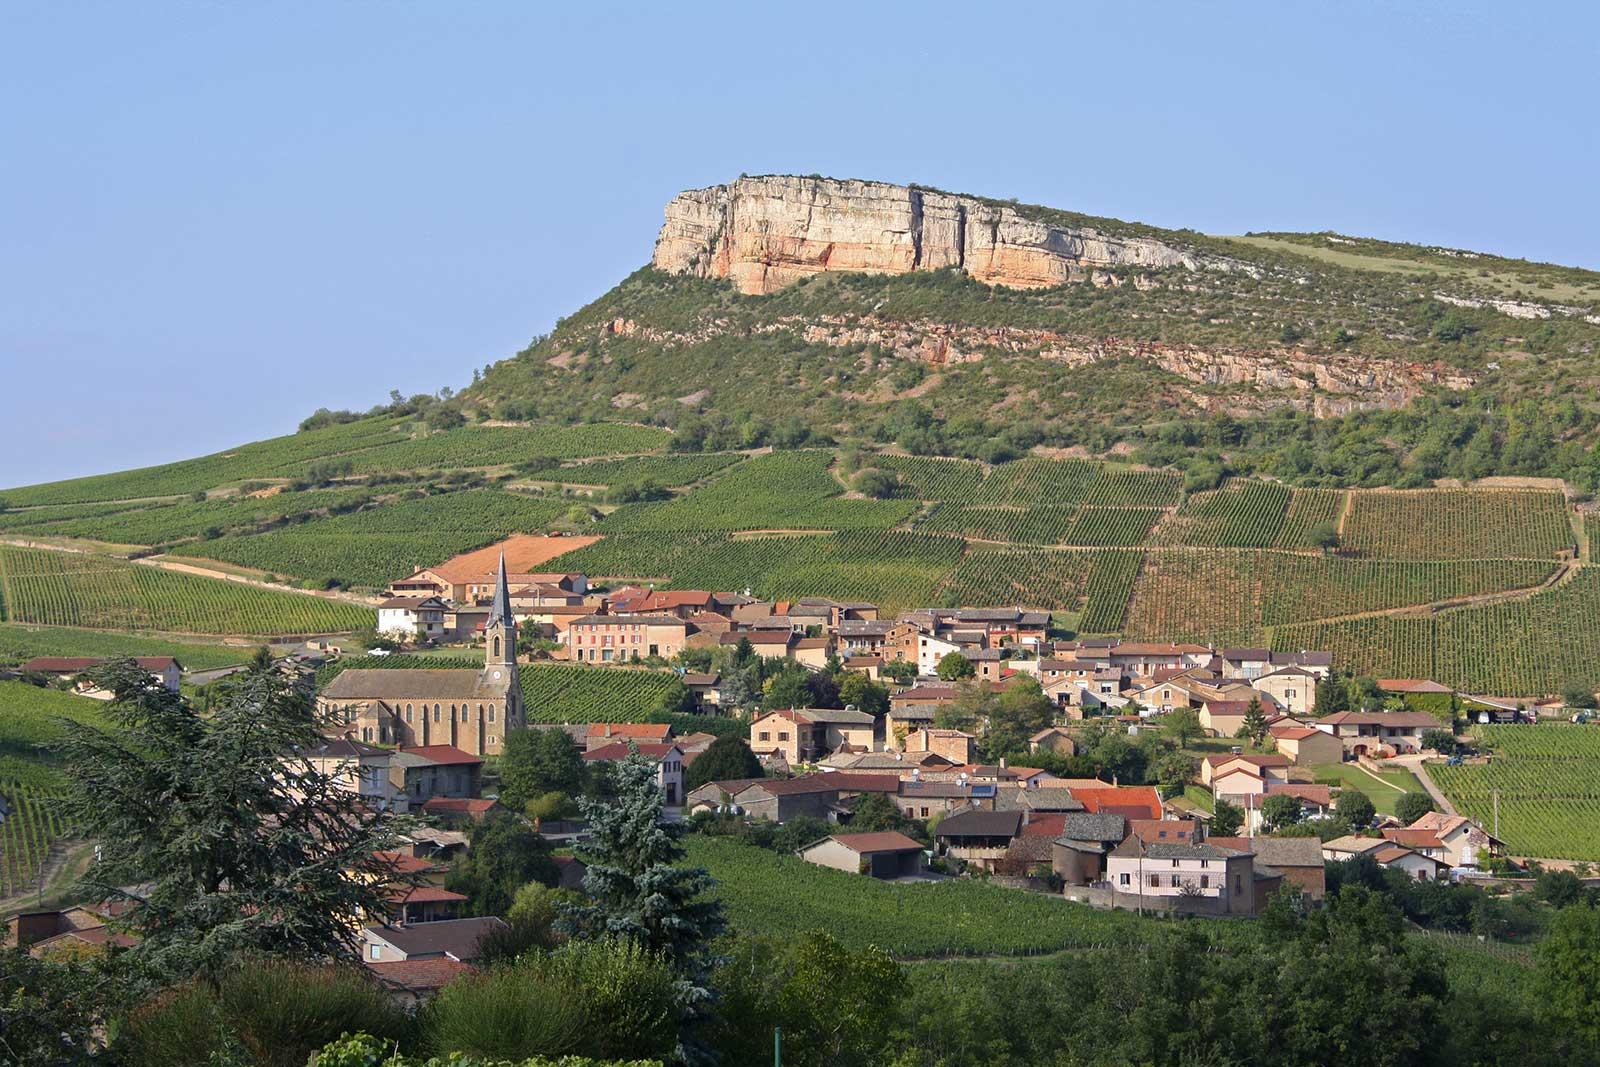 The scenic countryside of Pouilly-Fuissé. ©Frederick Wildman/Château Fuissé